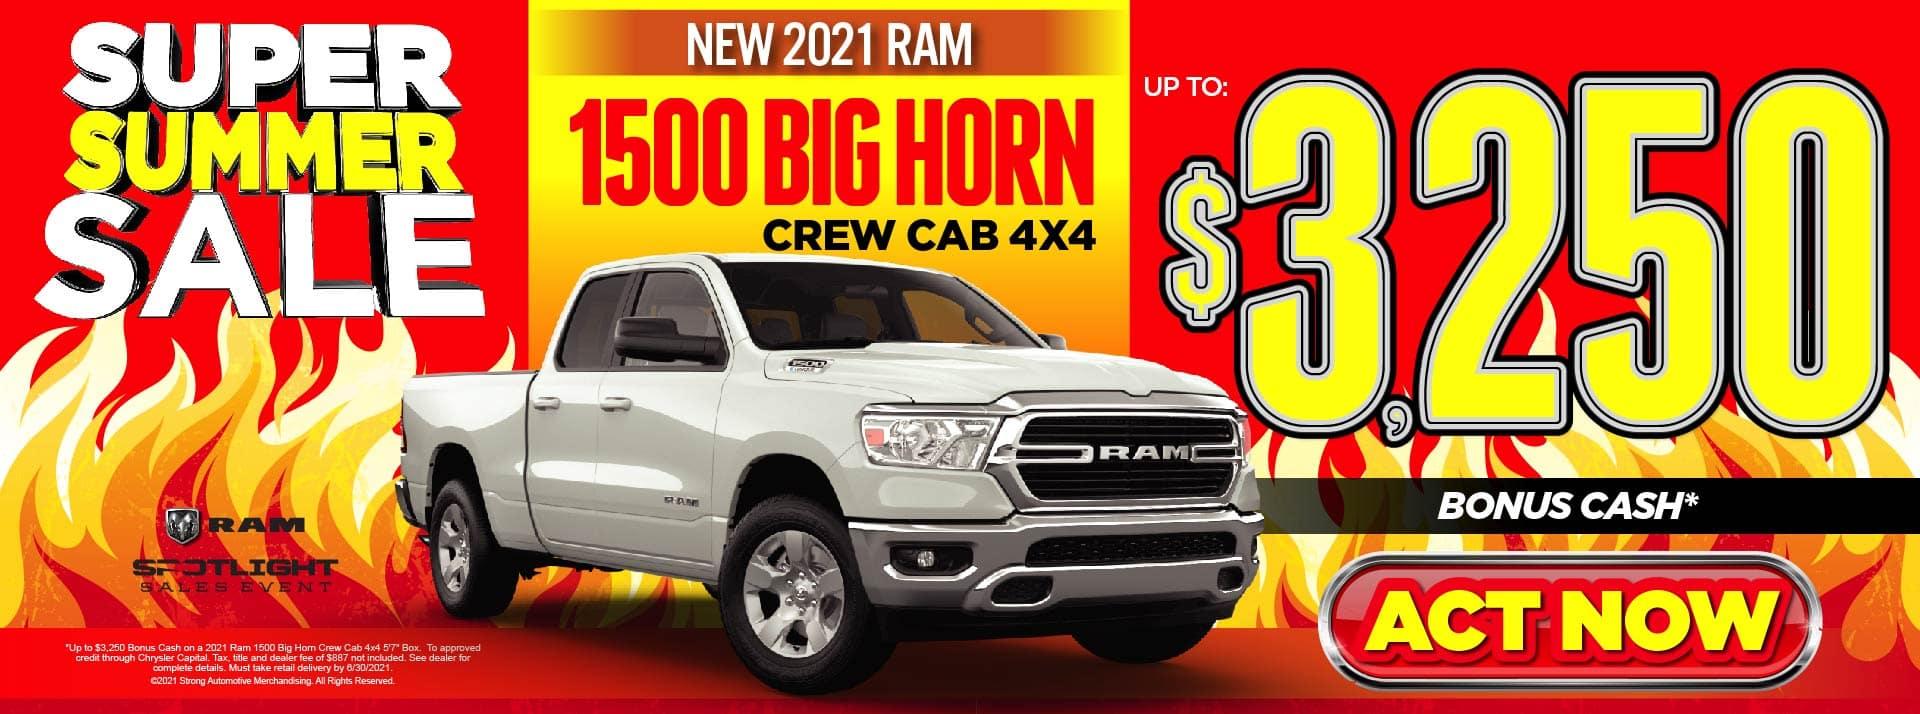 NEW 2021 RAM 1500 BIG HORN UP TO $3250 BONUS CASH* ACT NOW